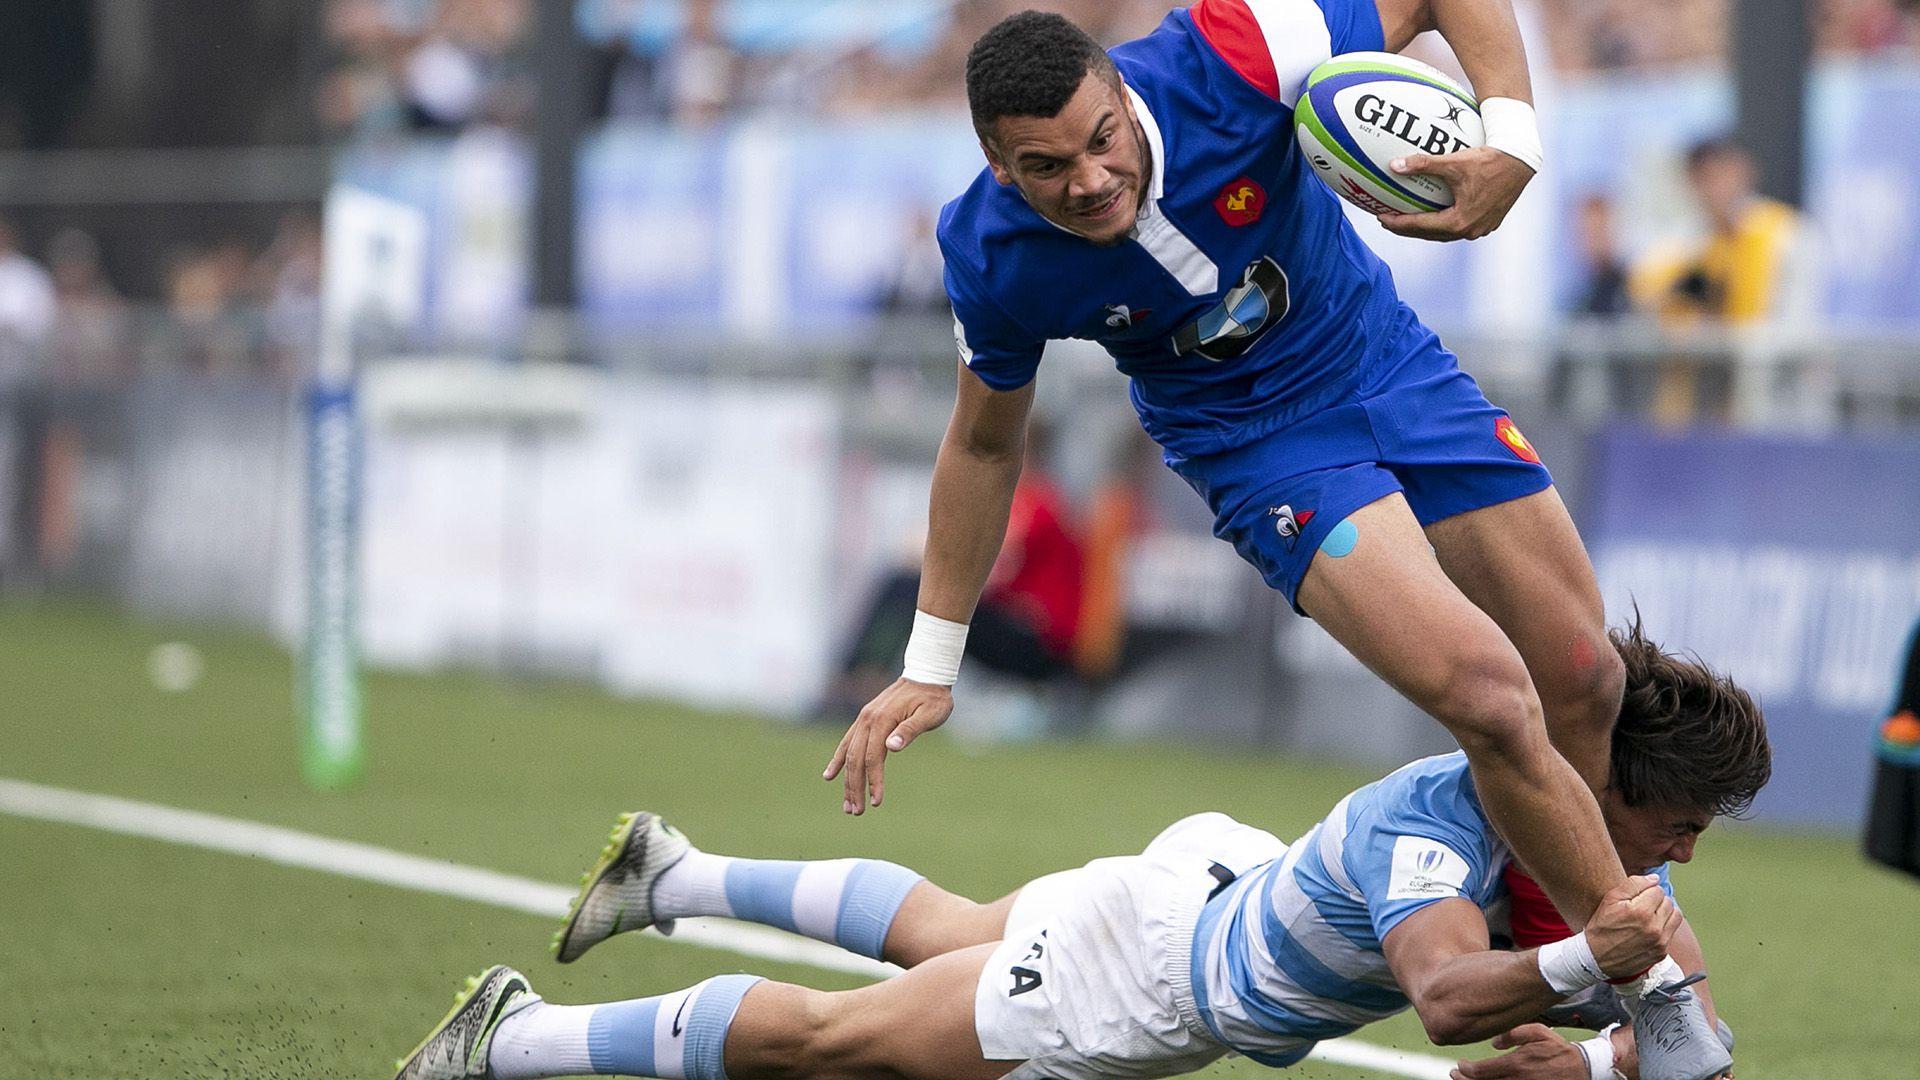 Joaquin de la Vega y un impactante tackle ante Mathis Label en la enorme victoria de Argentina (Foto: Juan Gasparini / AFP)